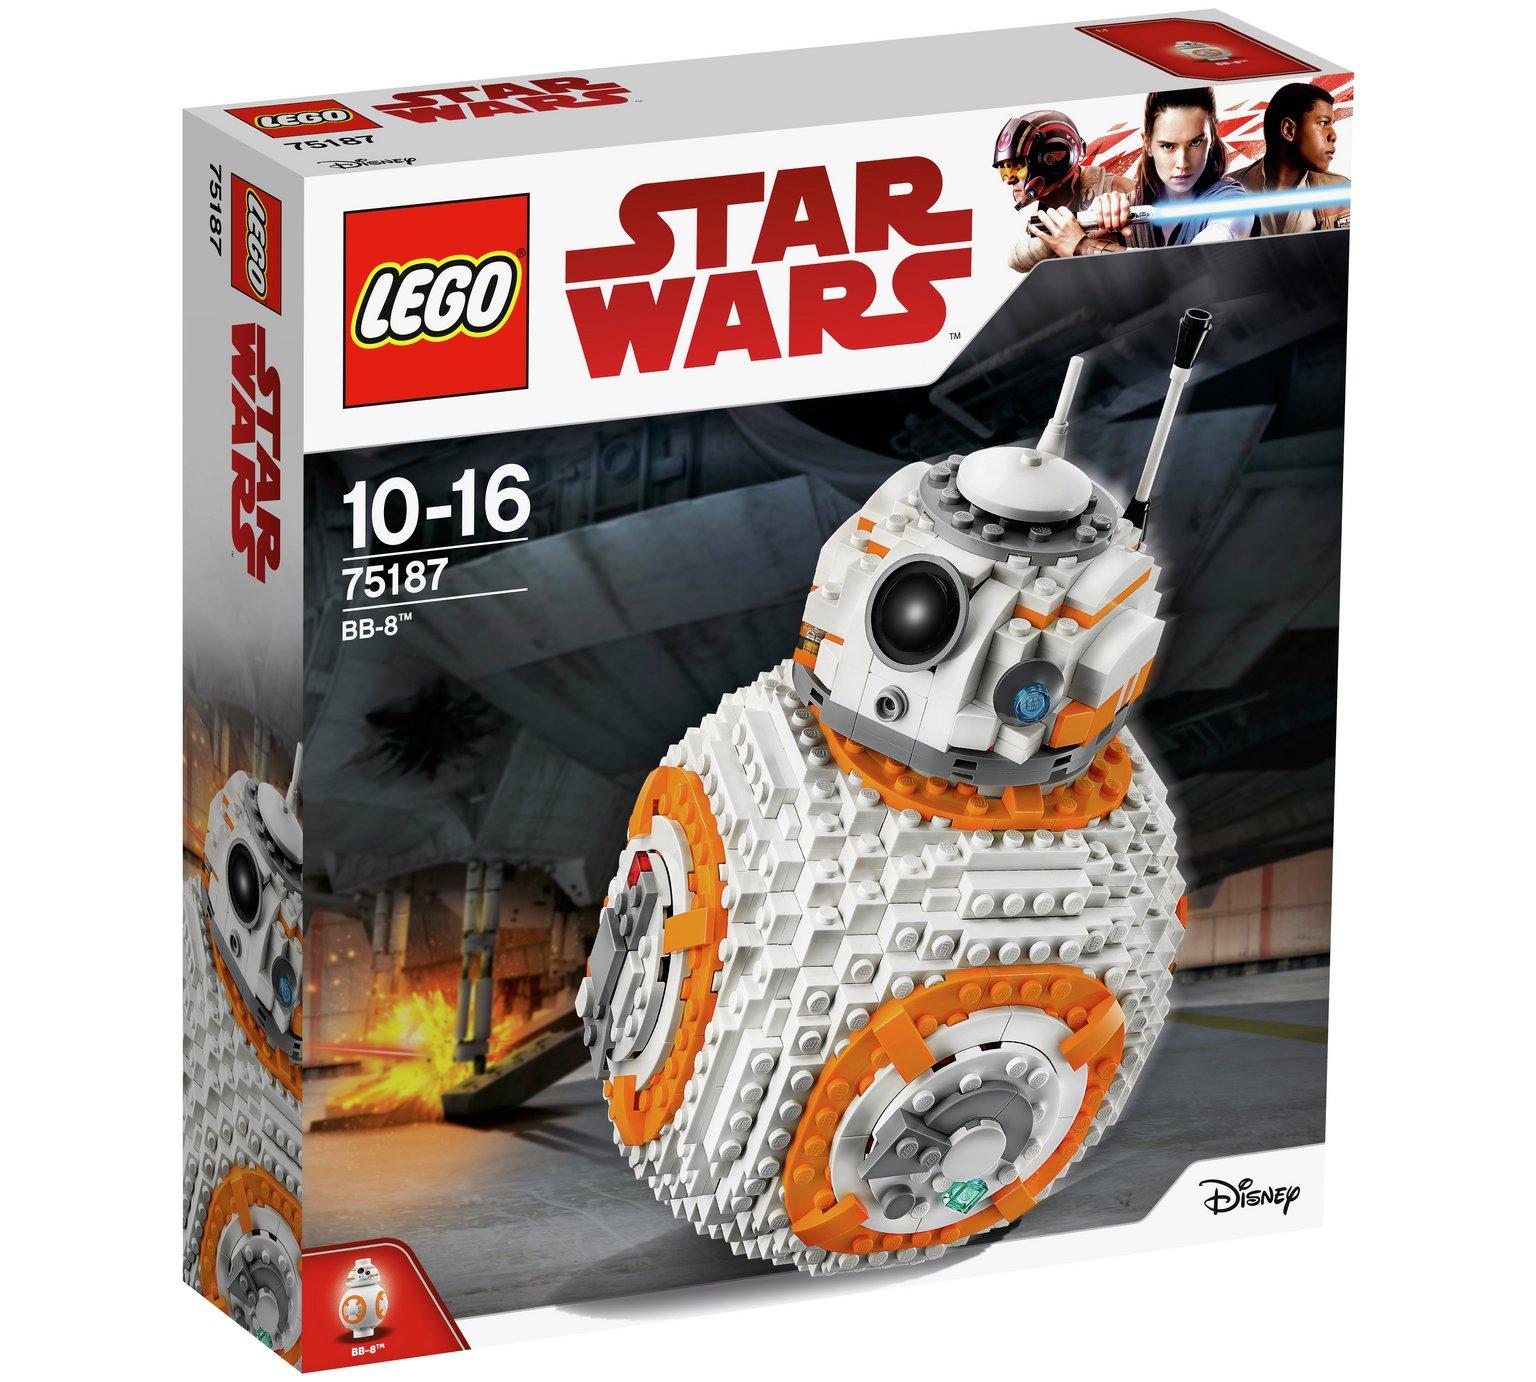 LEGO Star Wars BB-8 75187 £56 + 500 Clubcard points on £30 Lego spend - 1000 Clubcard points on £60 spend - 2000 Clubcard points on £120 spend  @ Tesco Direct